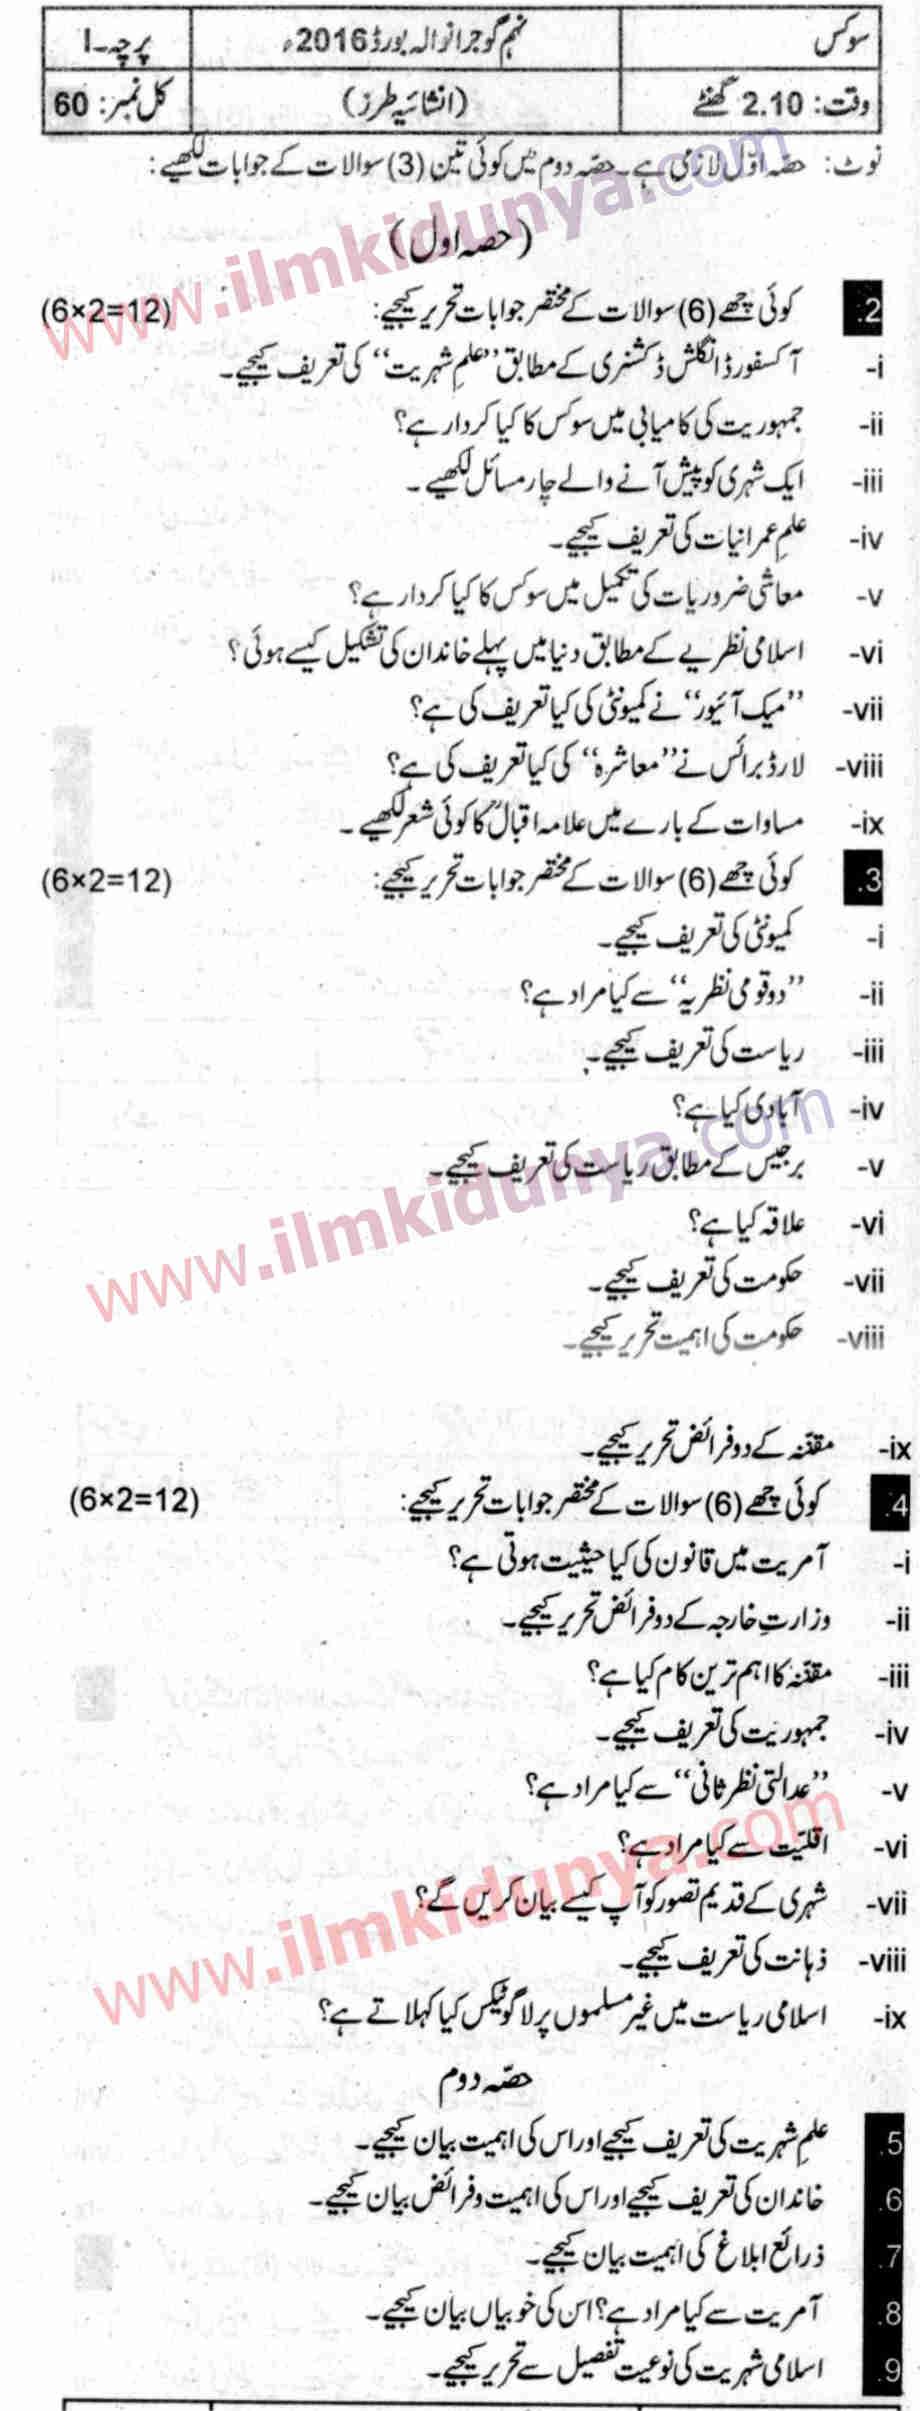 Past Papers 2016 Gujranwala Board 9th Class Civics Urdu